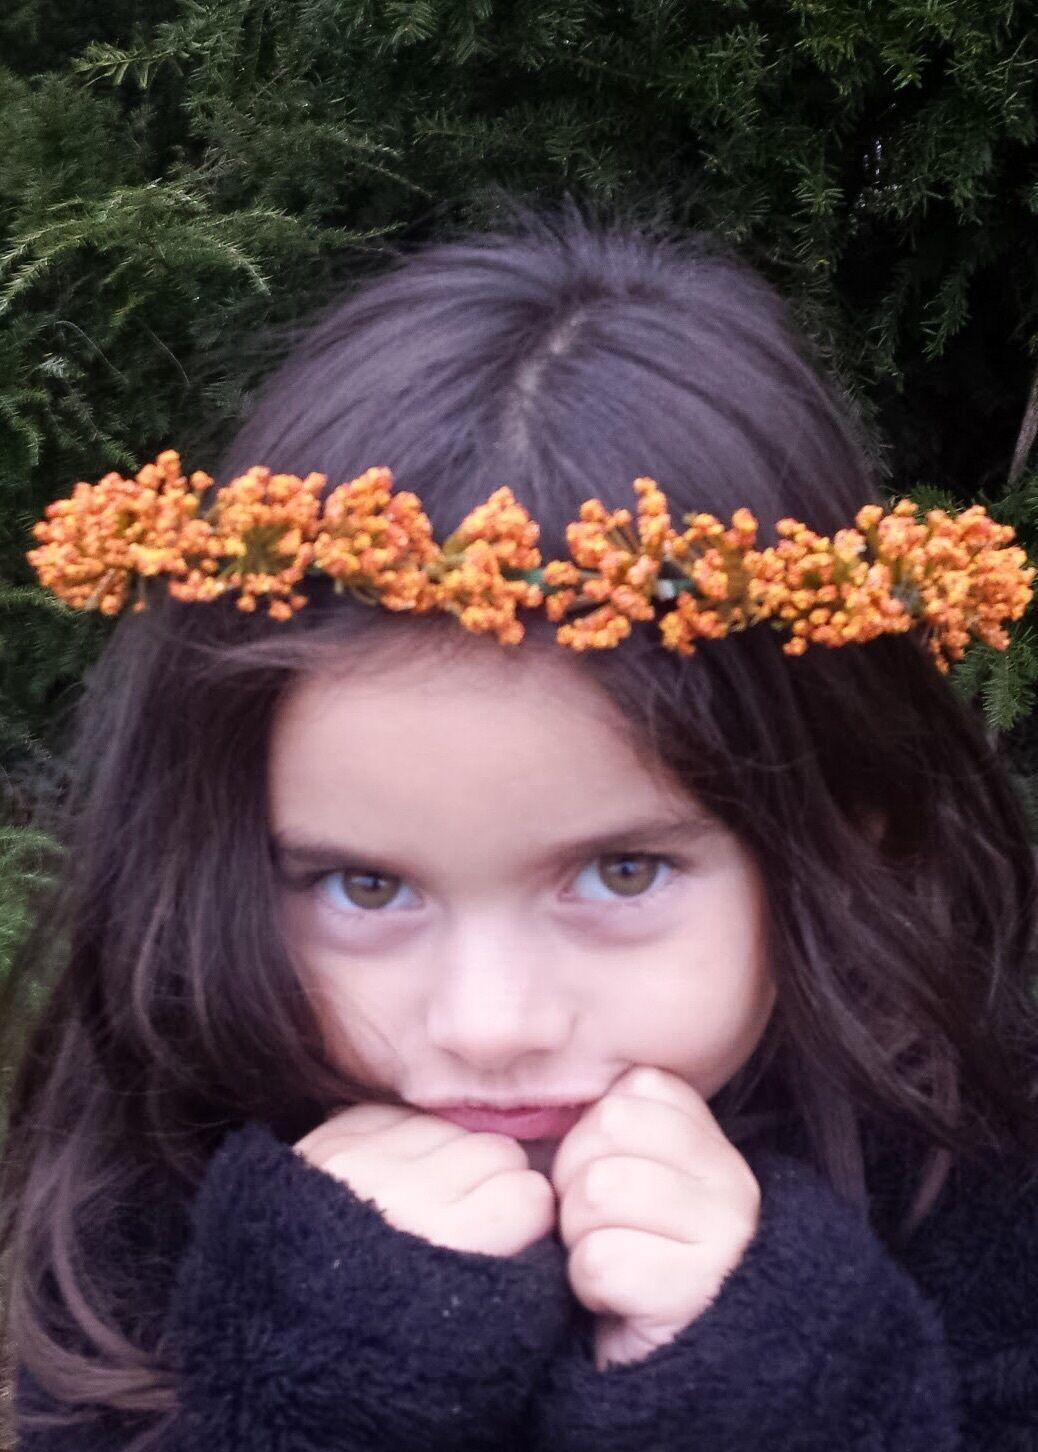 FloralTsar